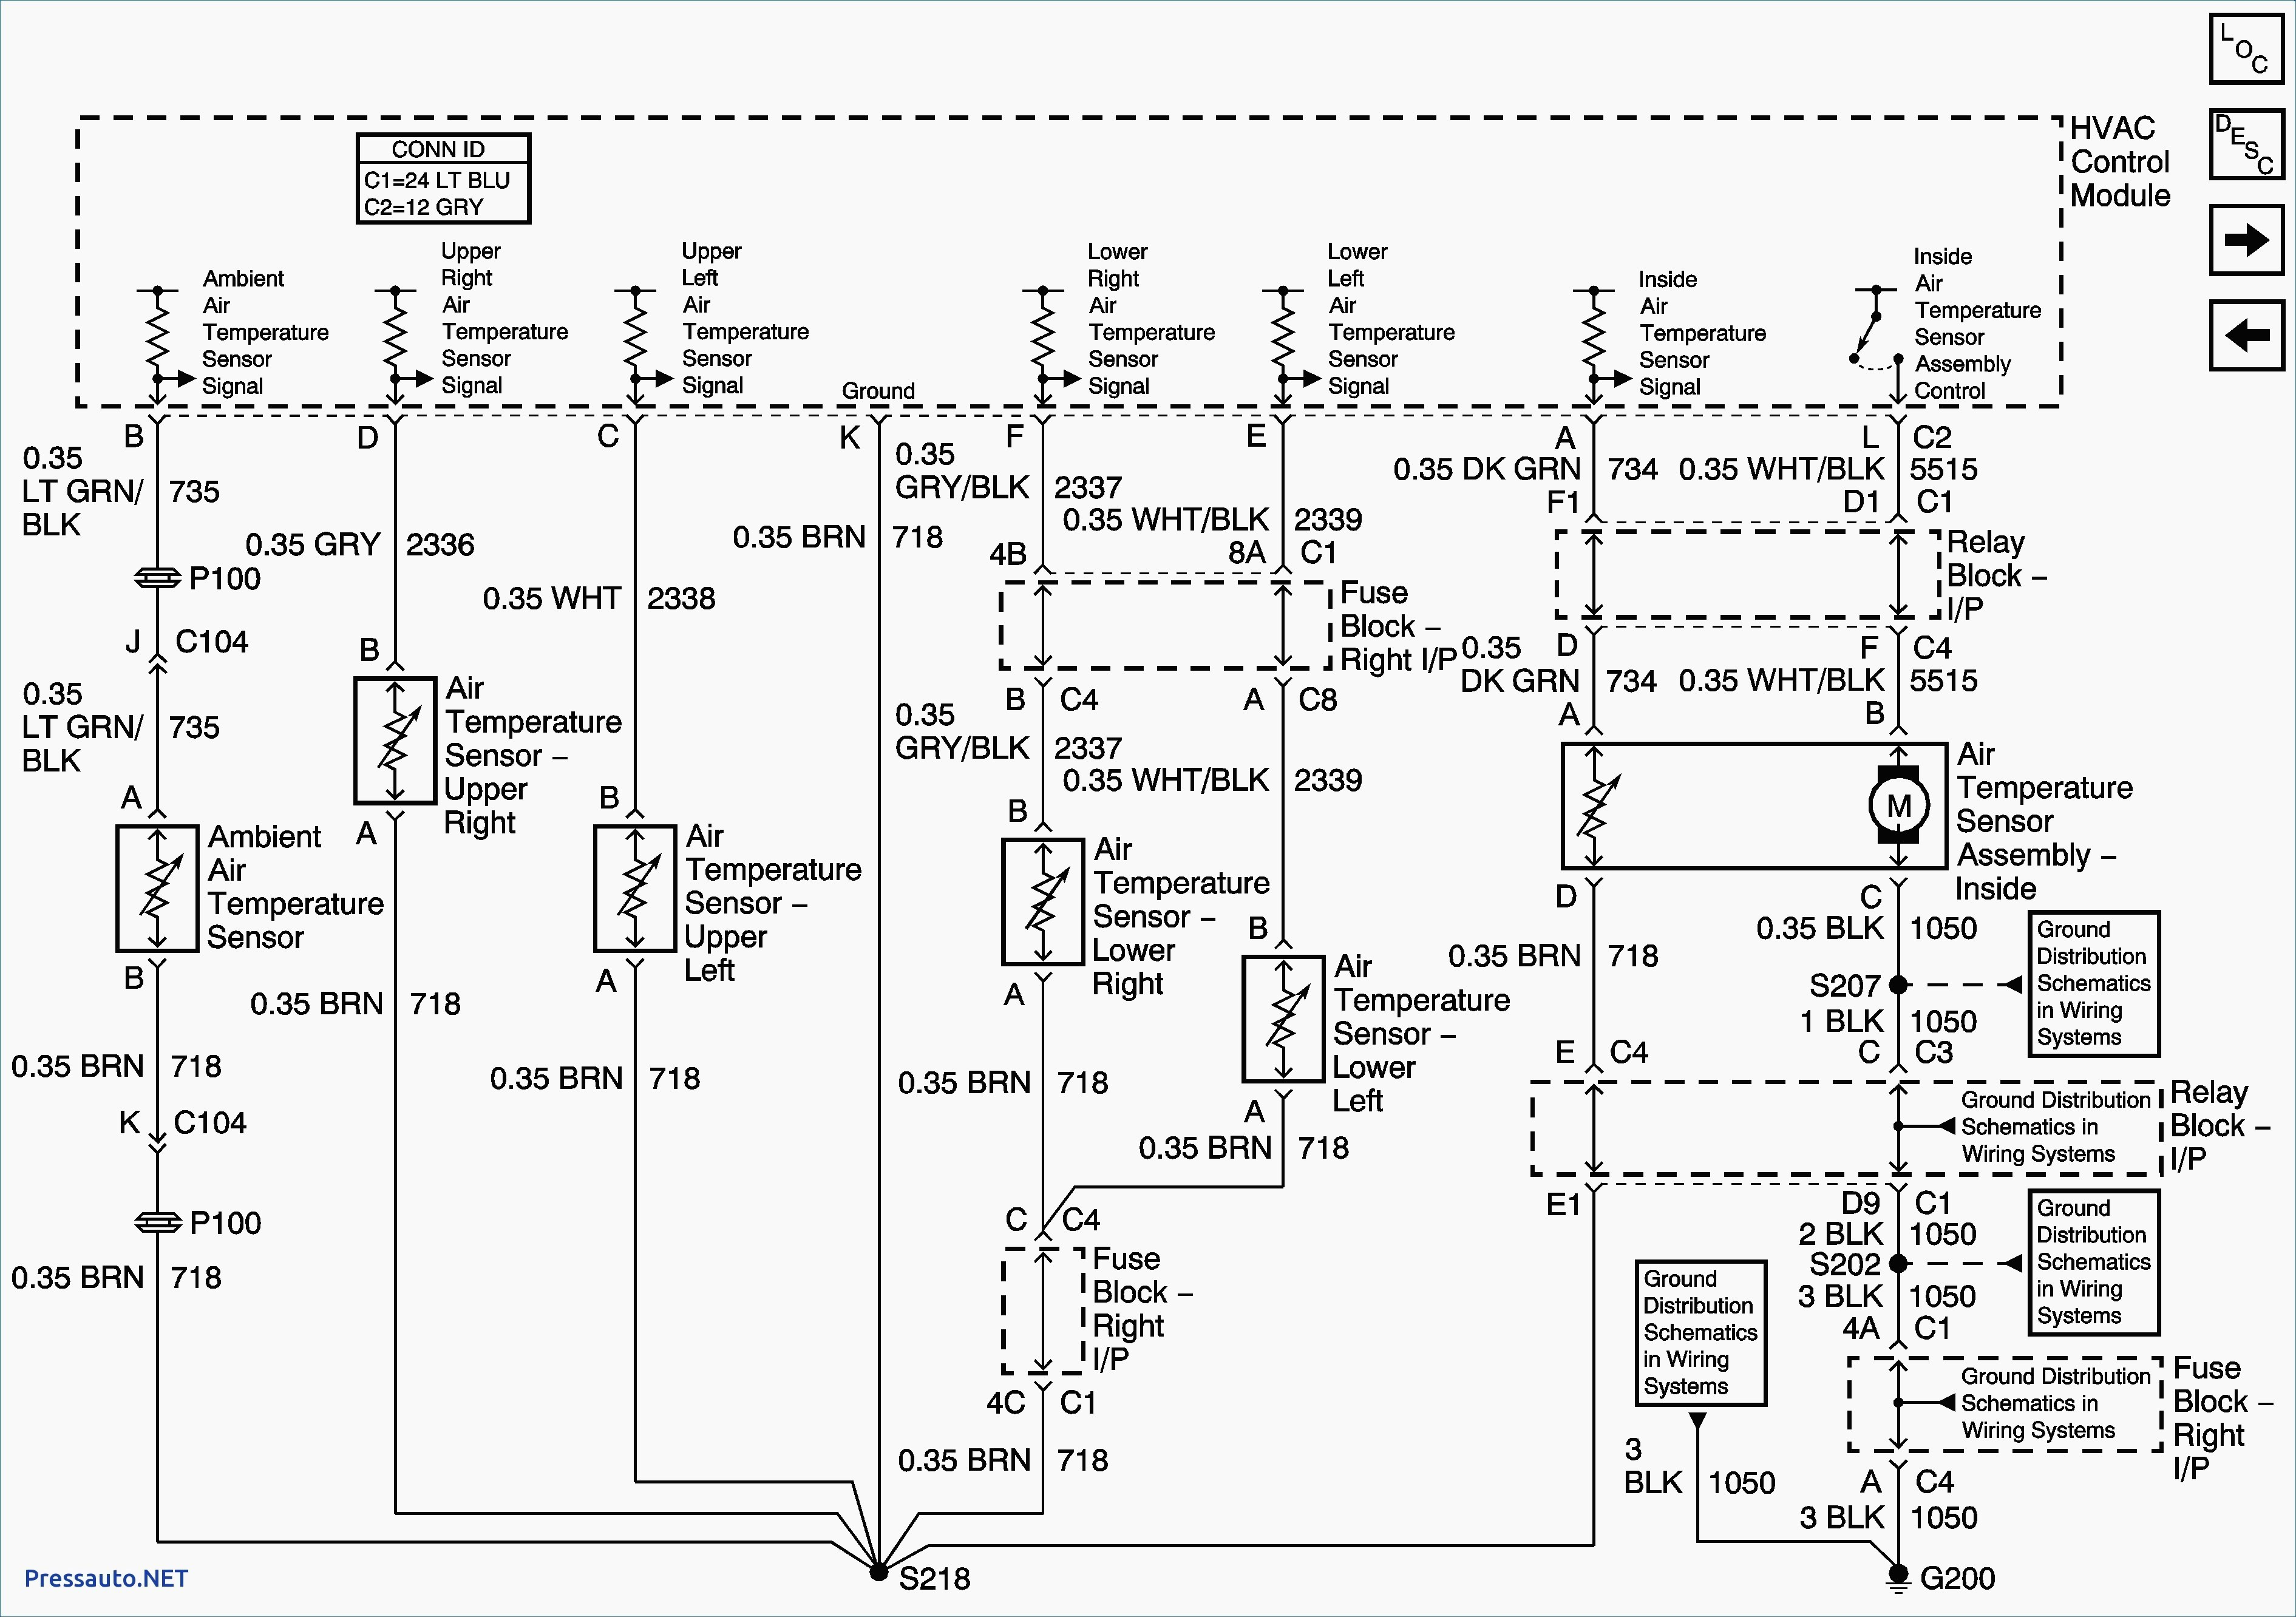 Honda F22 Engine Diagram Honda B18 Engine Diagram Honda Wiring Diagrams Instructions Of Honda F22 Engine Diagram